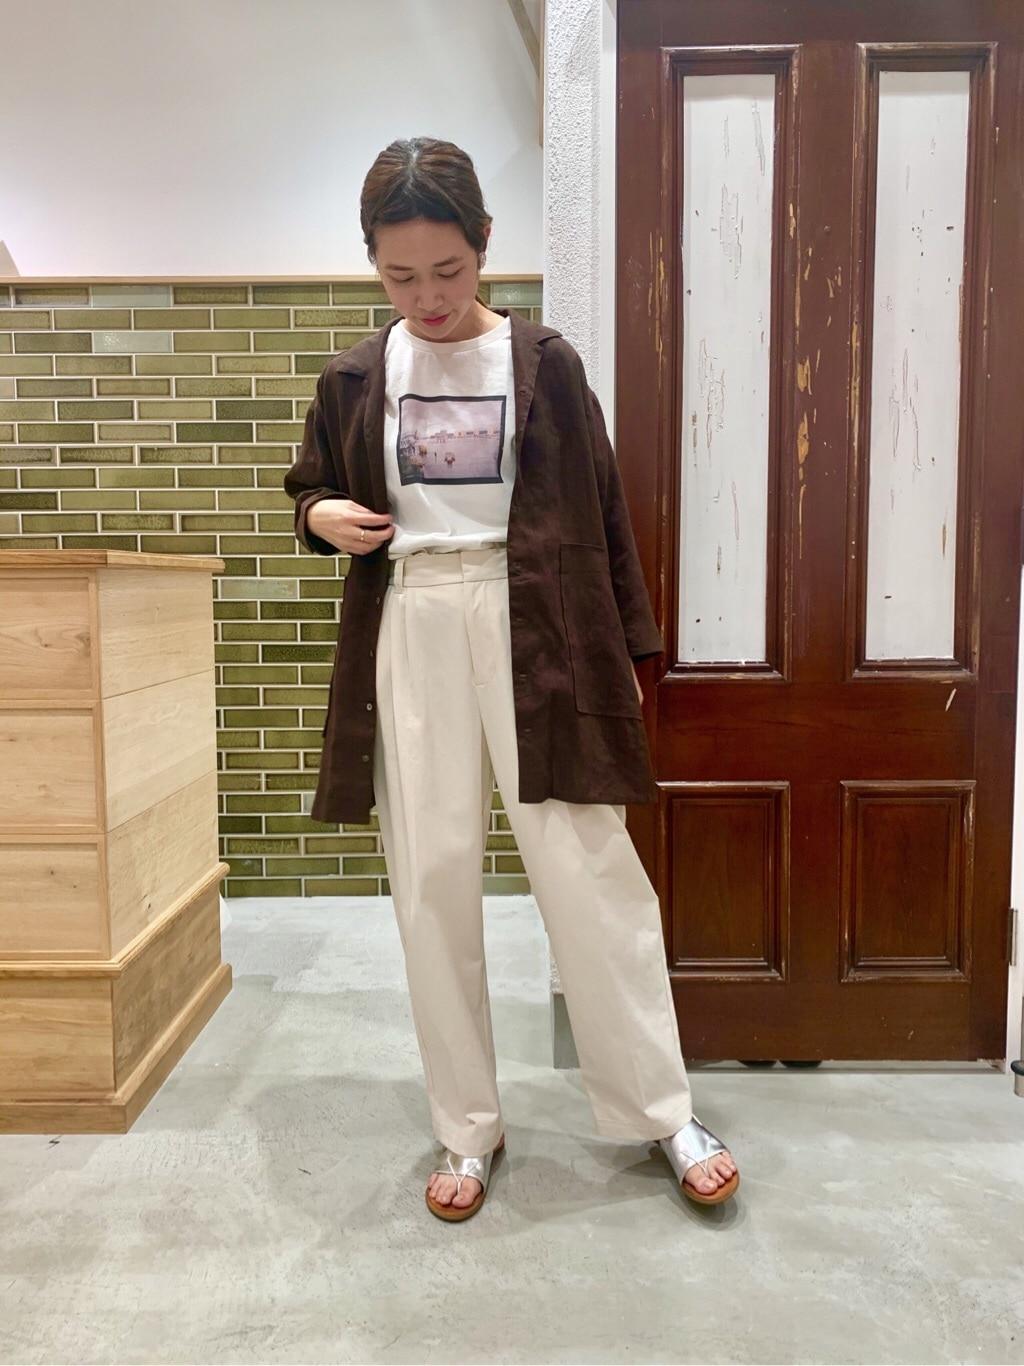 chambre de charme 横浜ジョイナス 身長:160cm 2020.06.09